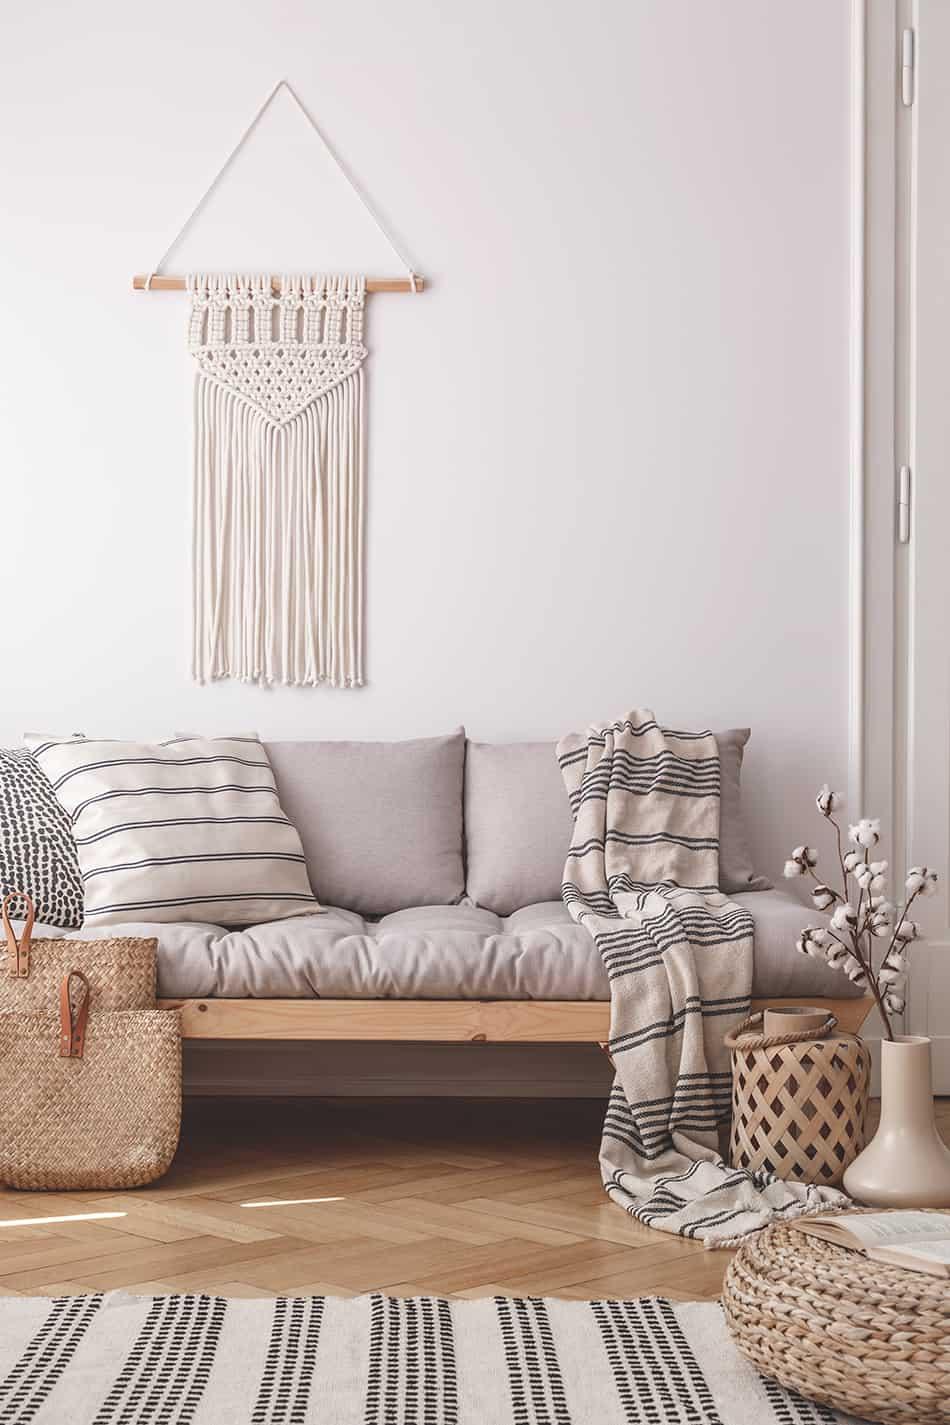 Hang a Handmade Textile